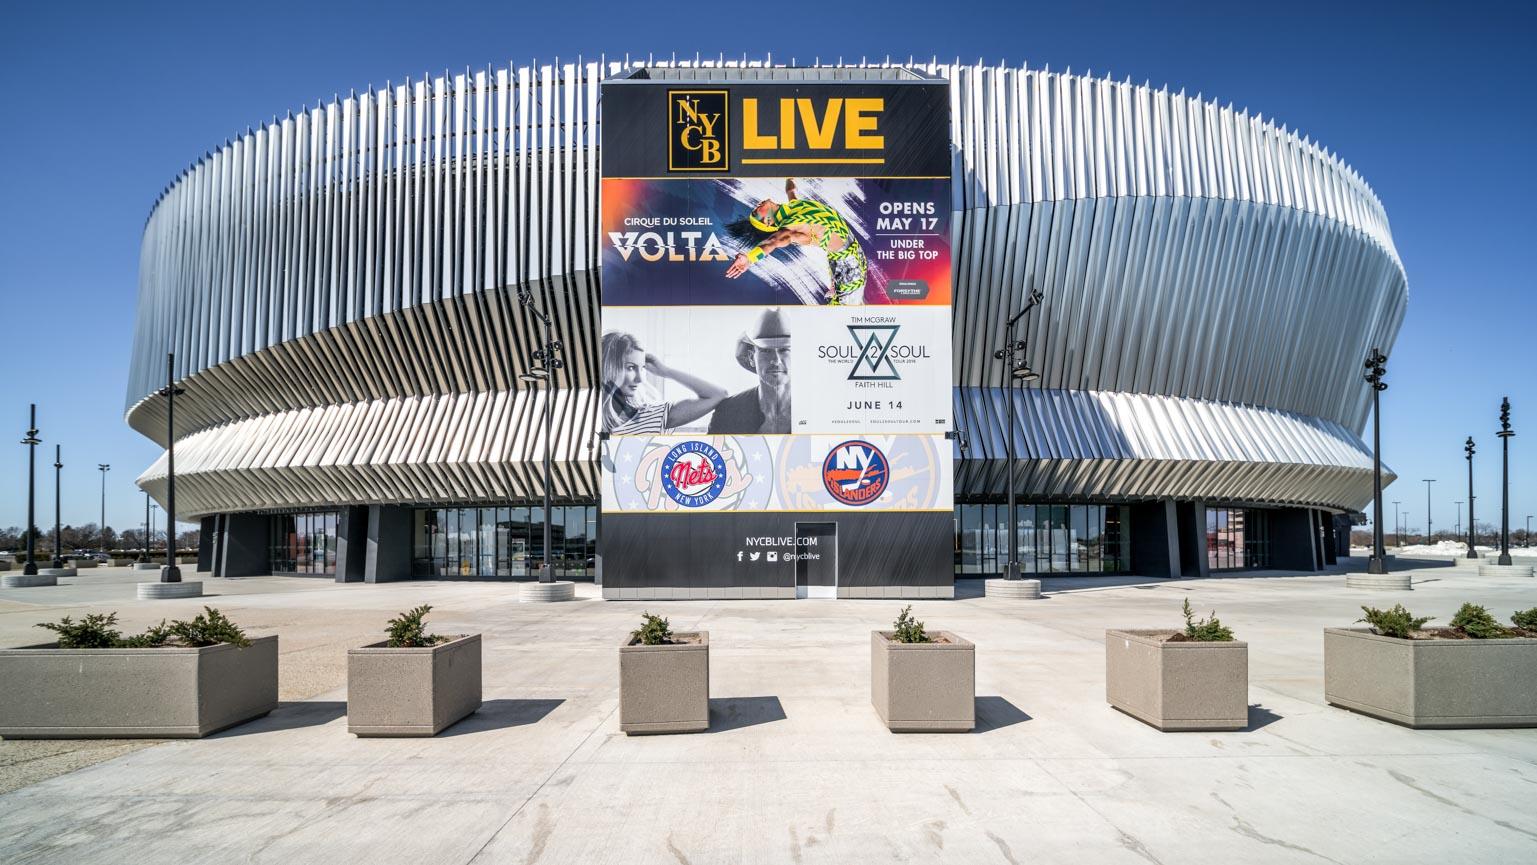 NYCB Nassau Veterans Memorial Coliseum